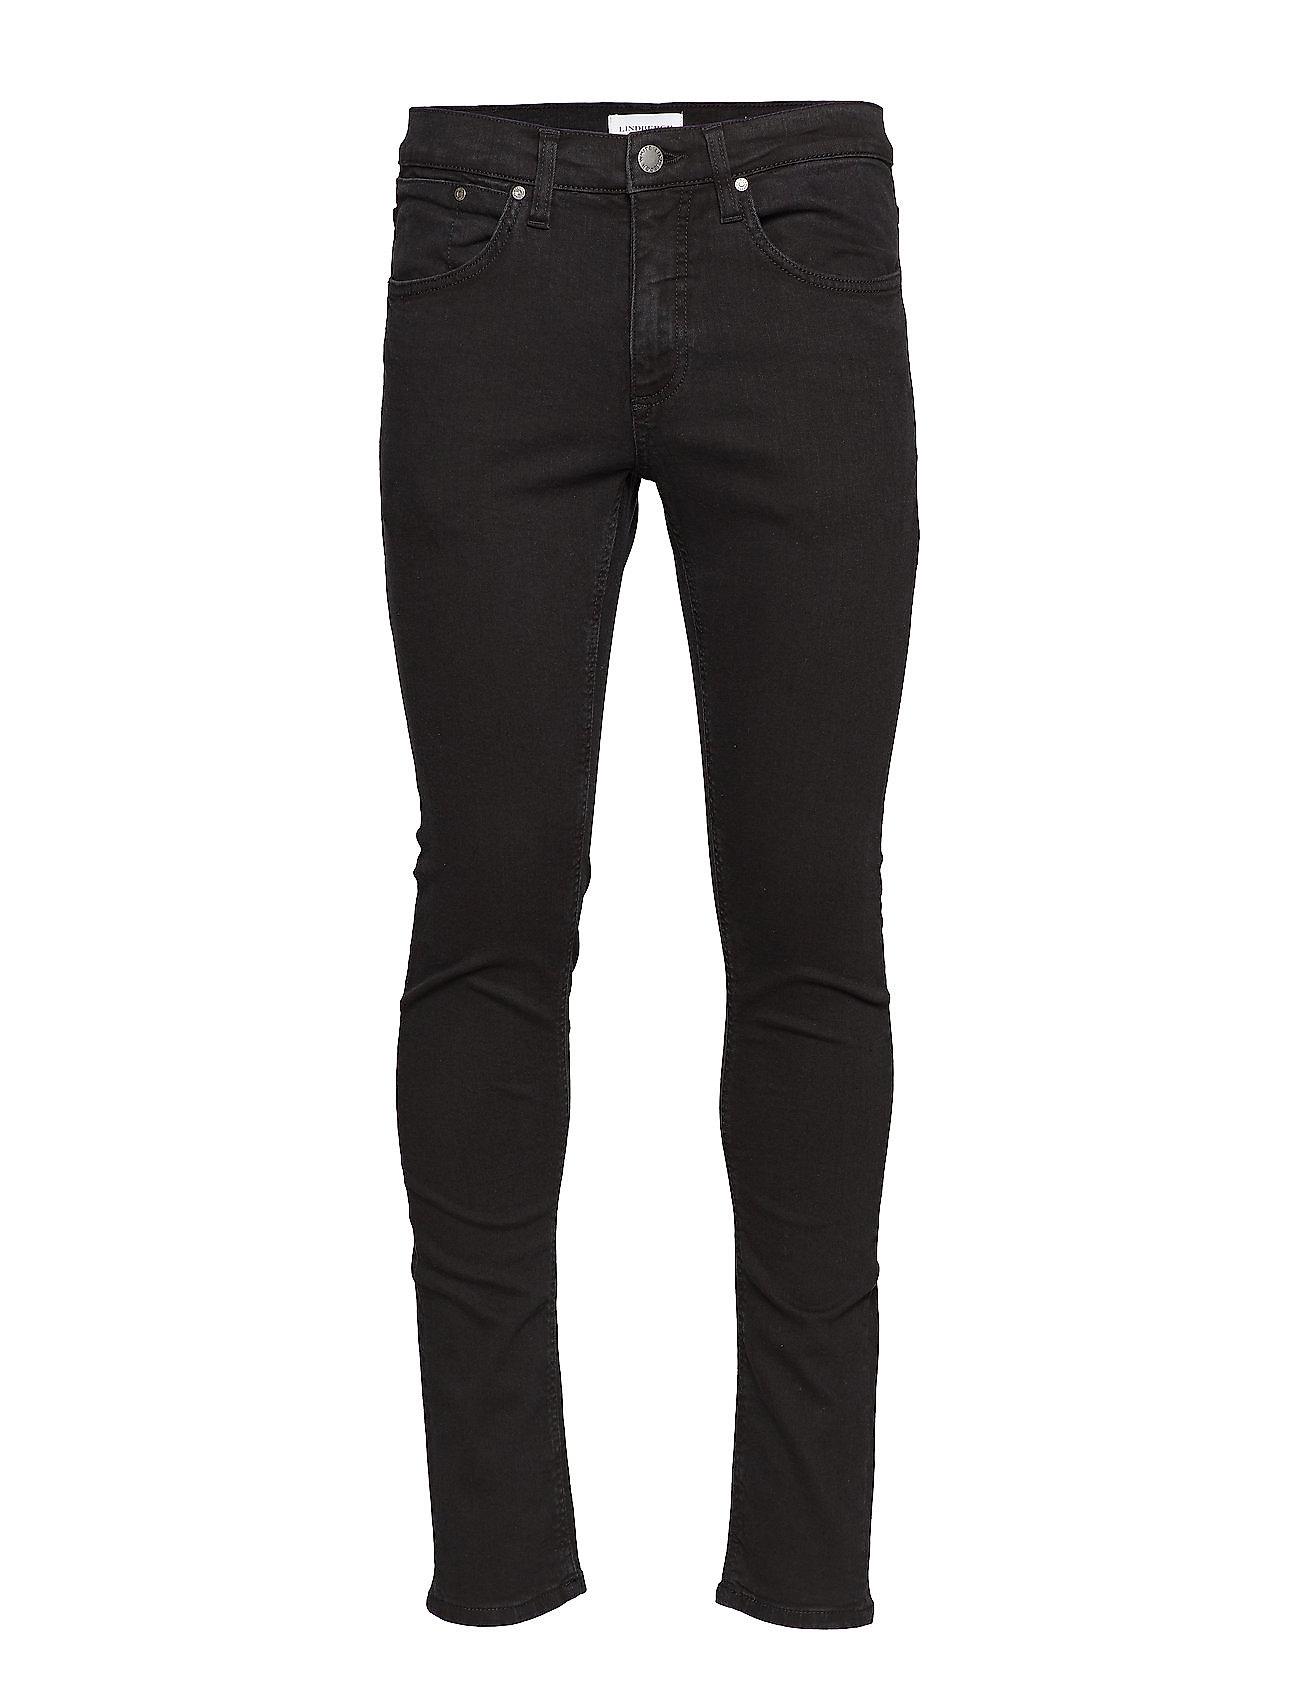 Lindbergh Slim jeans junk black - JUNK BLACK